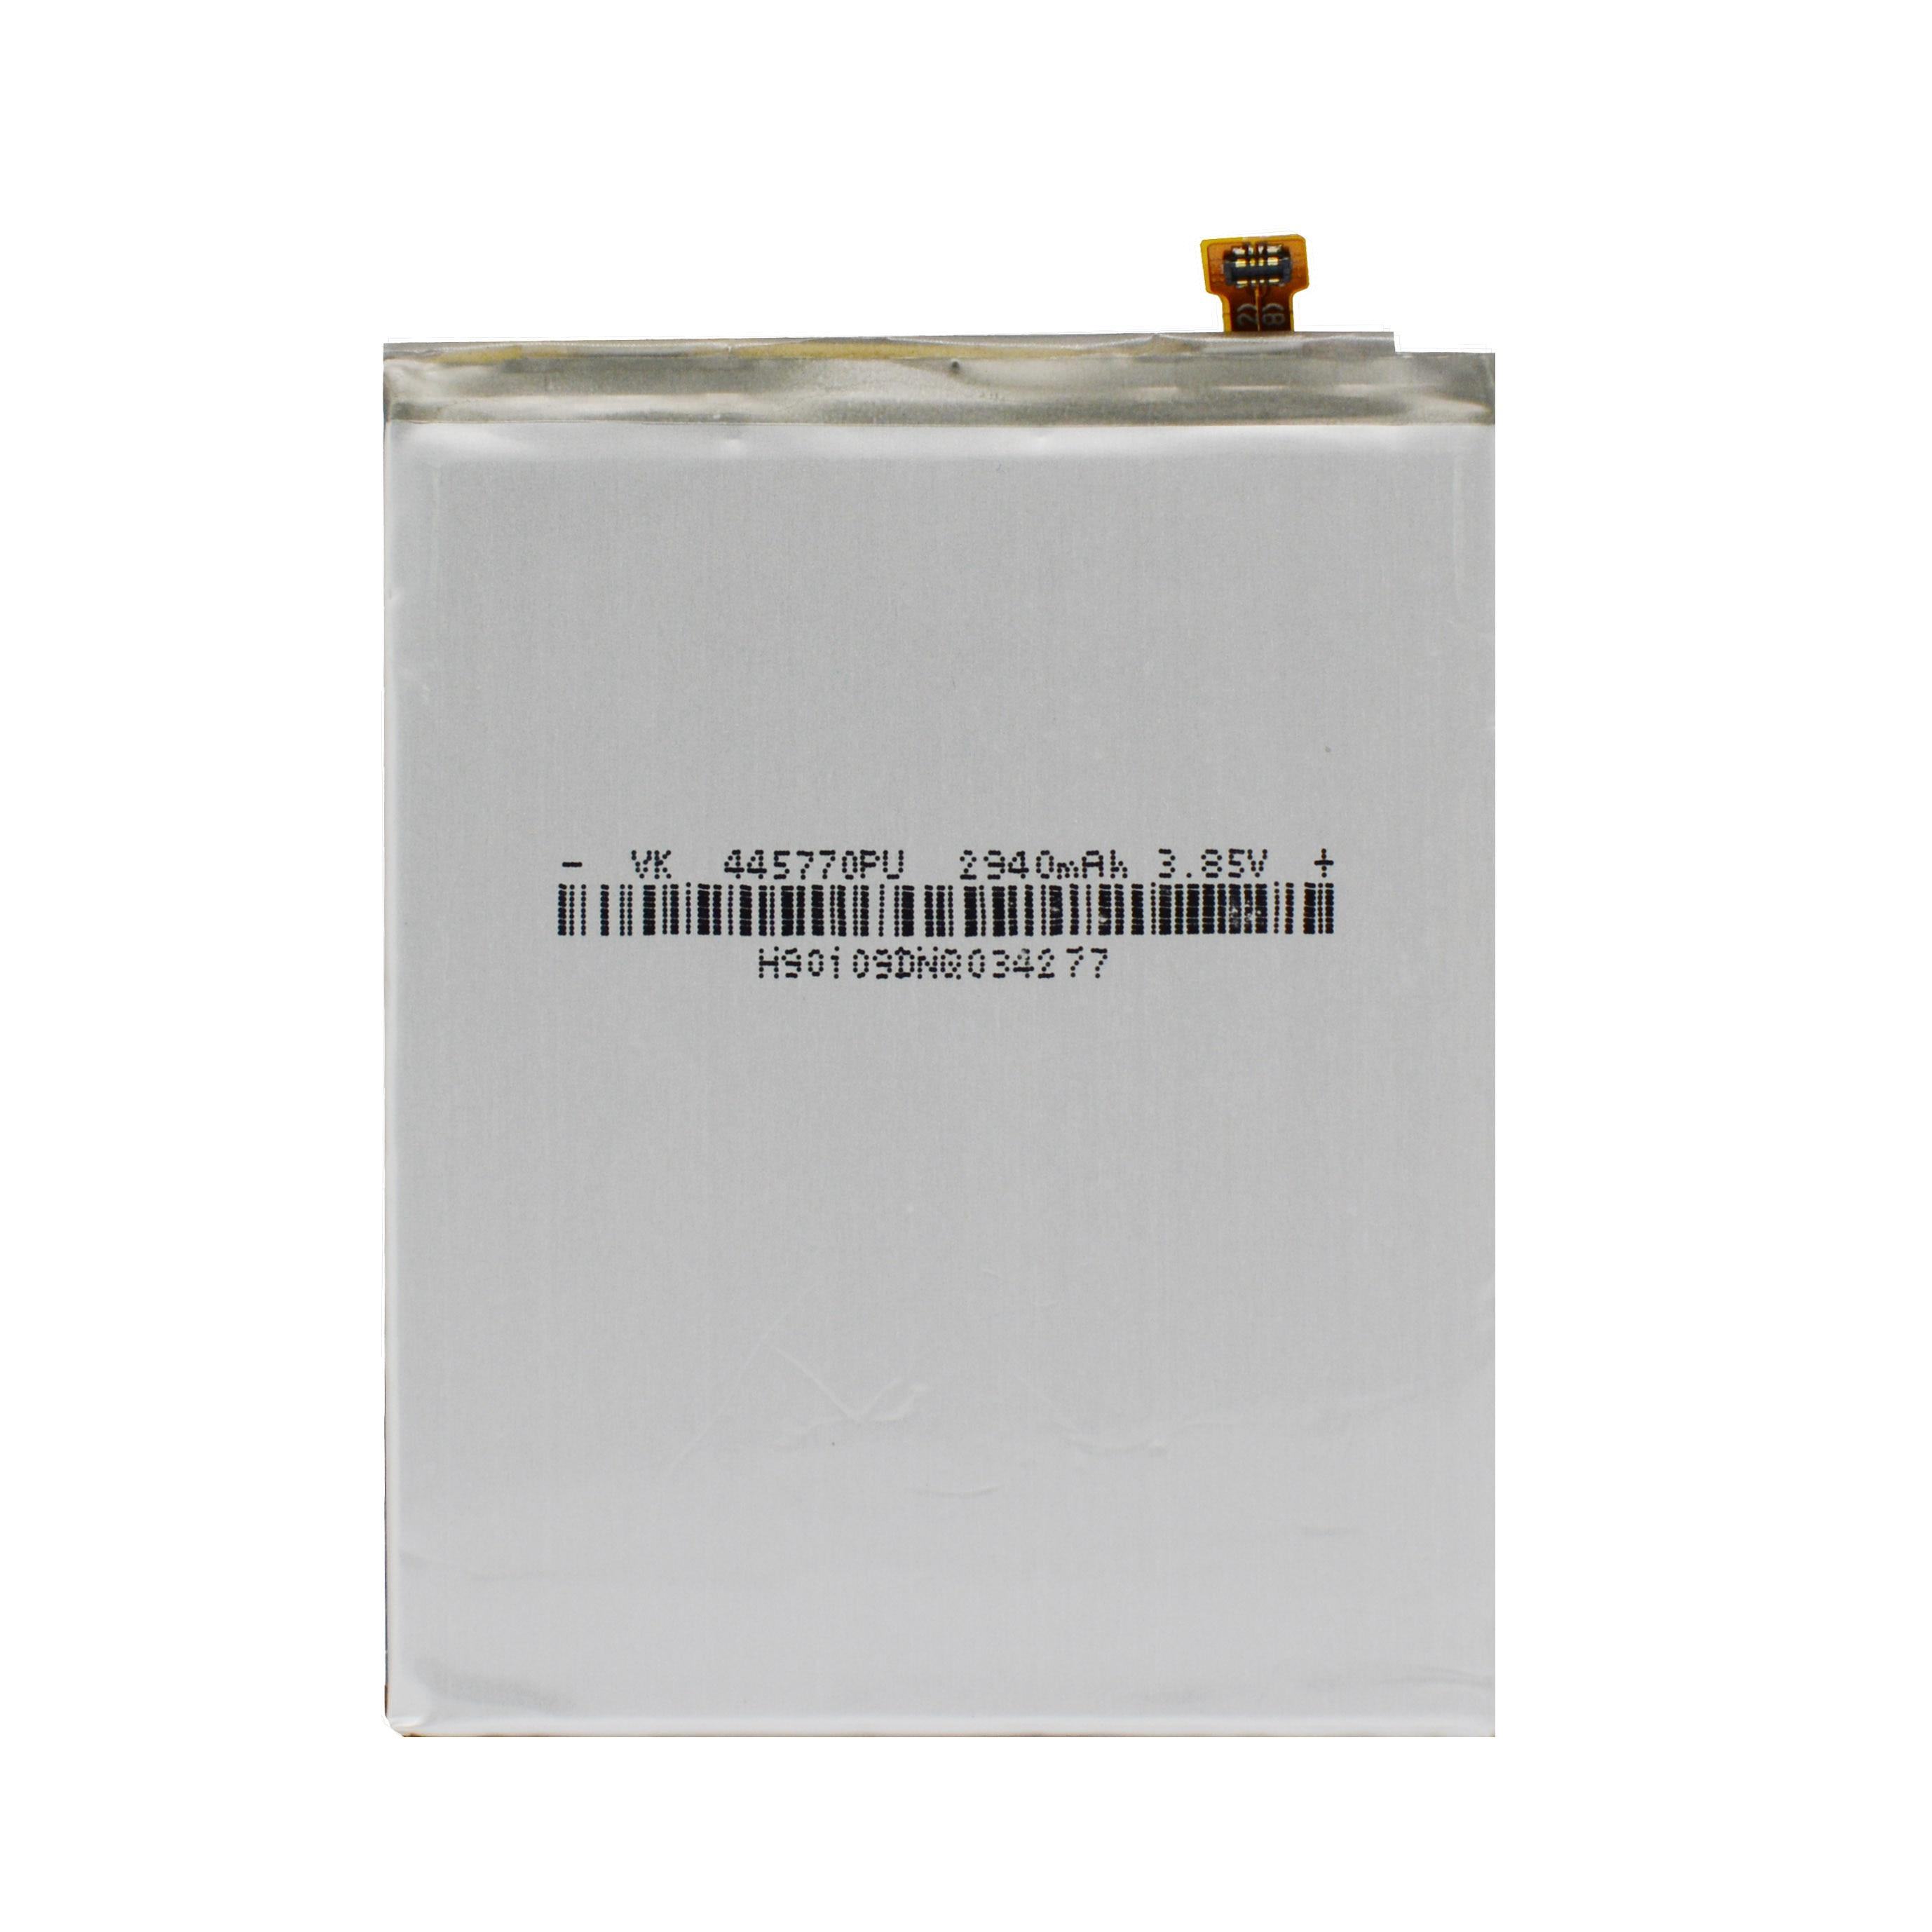 20pcs/lot High Quality Battery EB-BA202ABU For Samsung Galaxy A20e A20 SM-A202F A202F/DS  Phone Batteries 3000mAh enlarge